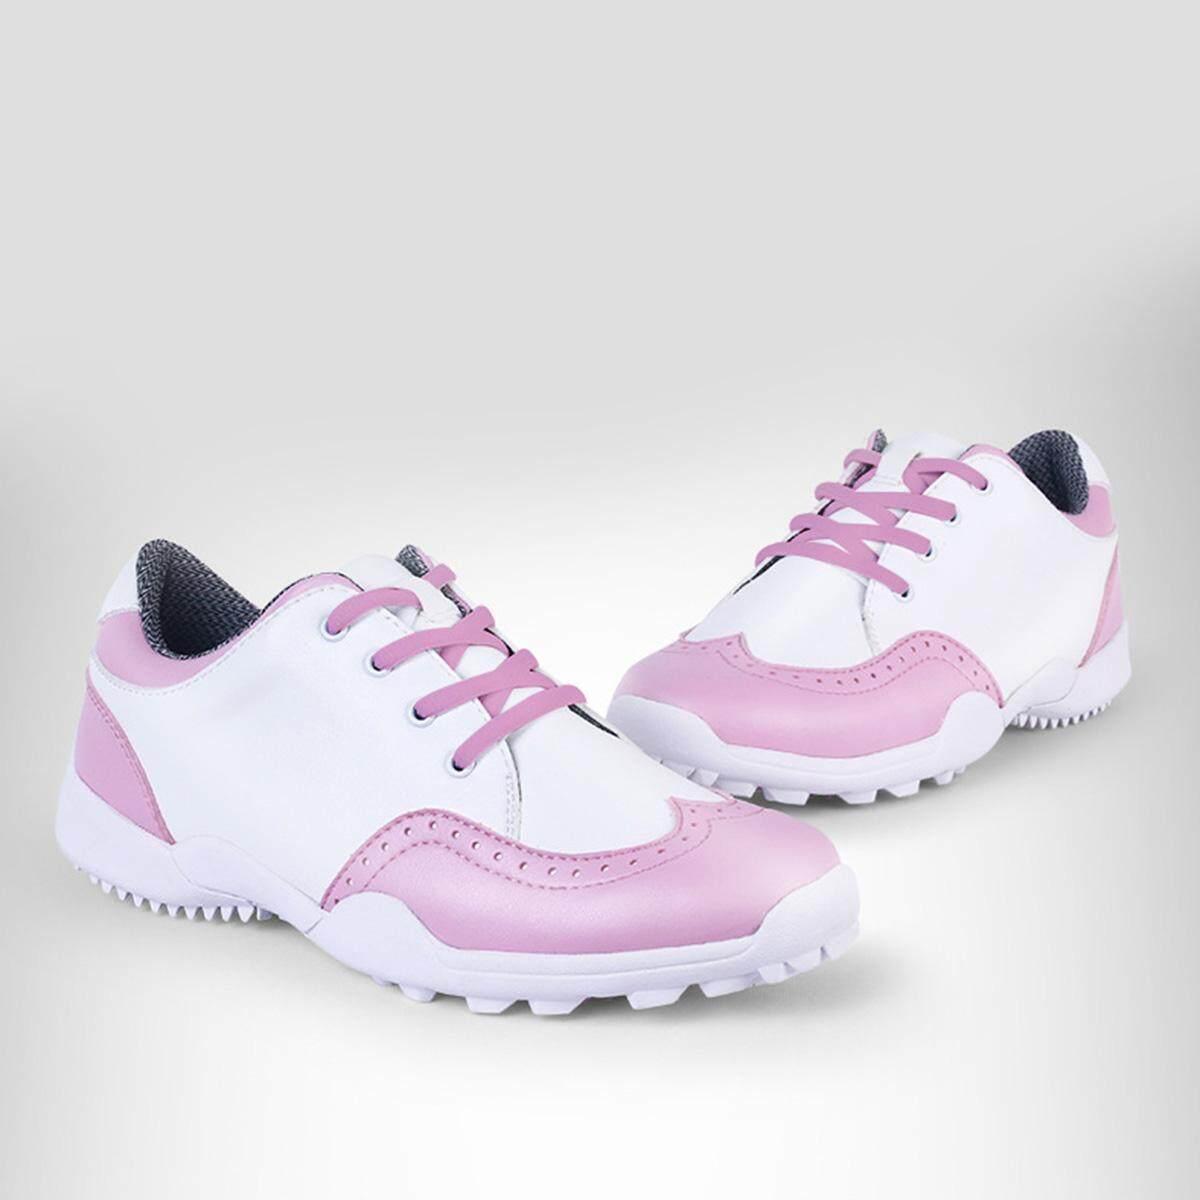 Women Lace Up Sport Golf Shoes Color Pink/black Size 35-39 By Yunhaitech.